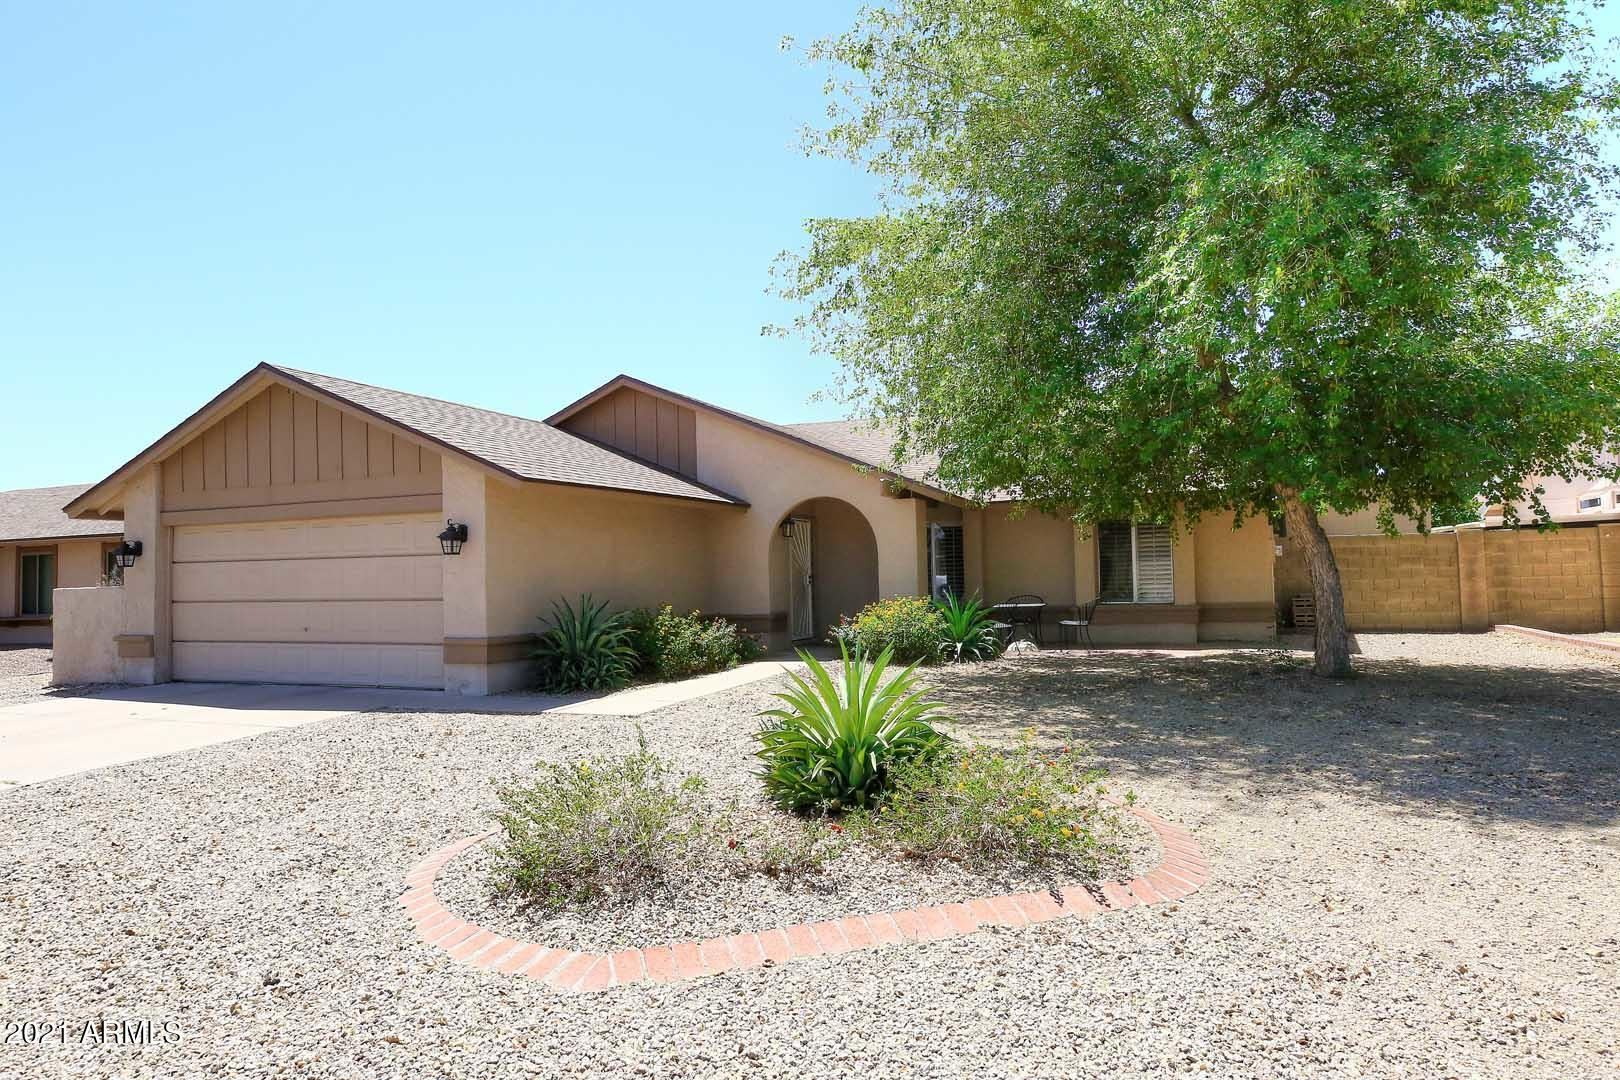 3137 W JUNIPER Avenue, Phoenix, AZ 85053 - MLS#: 6239338